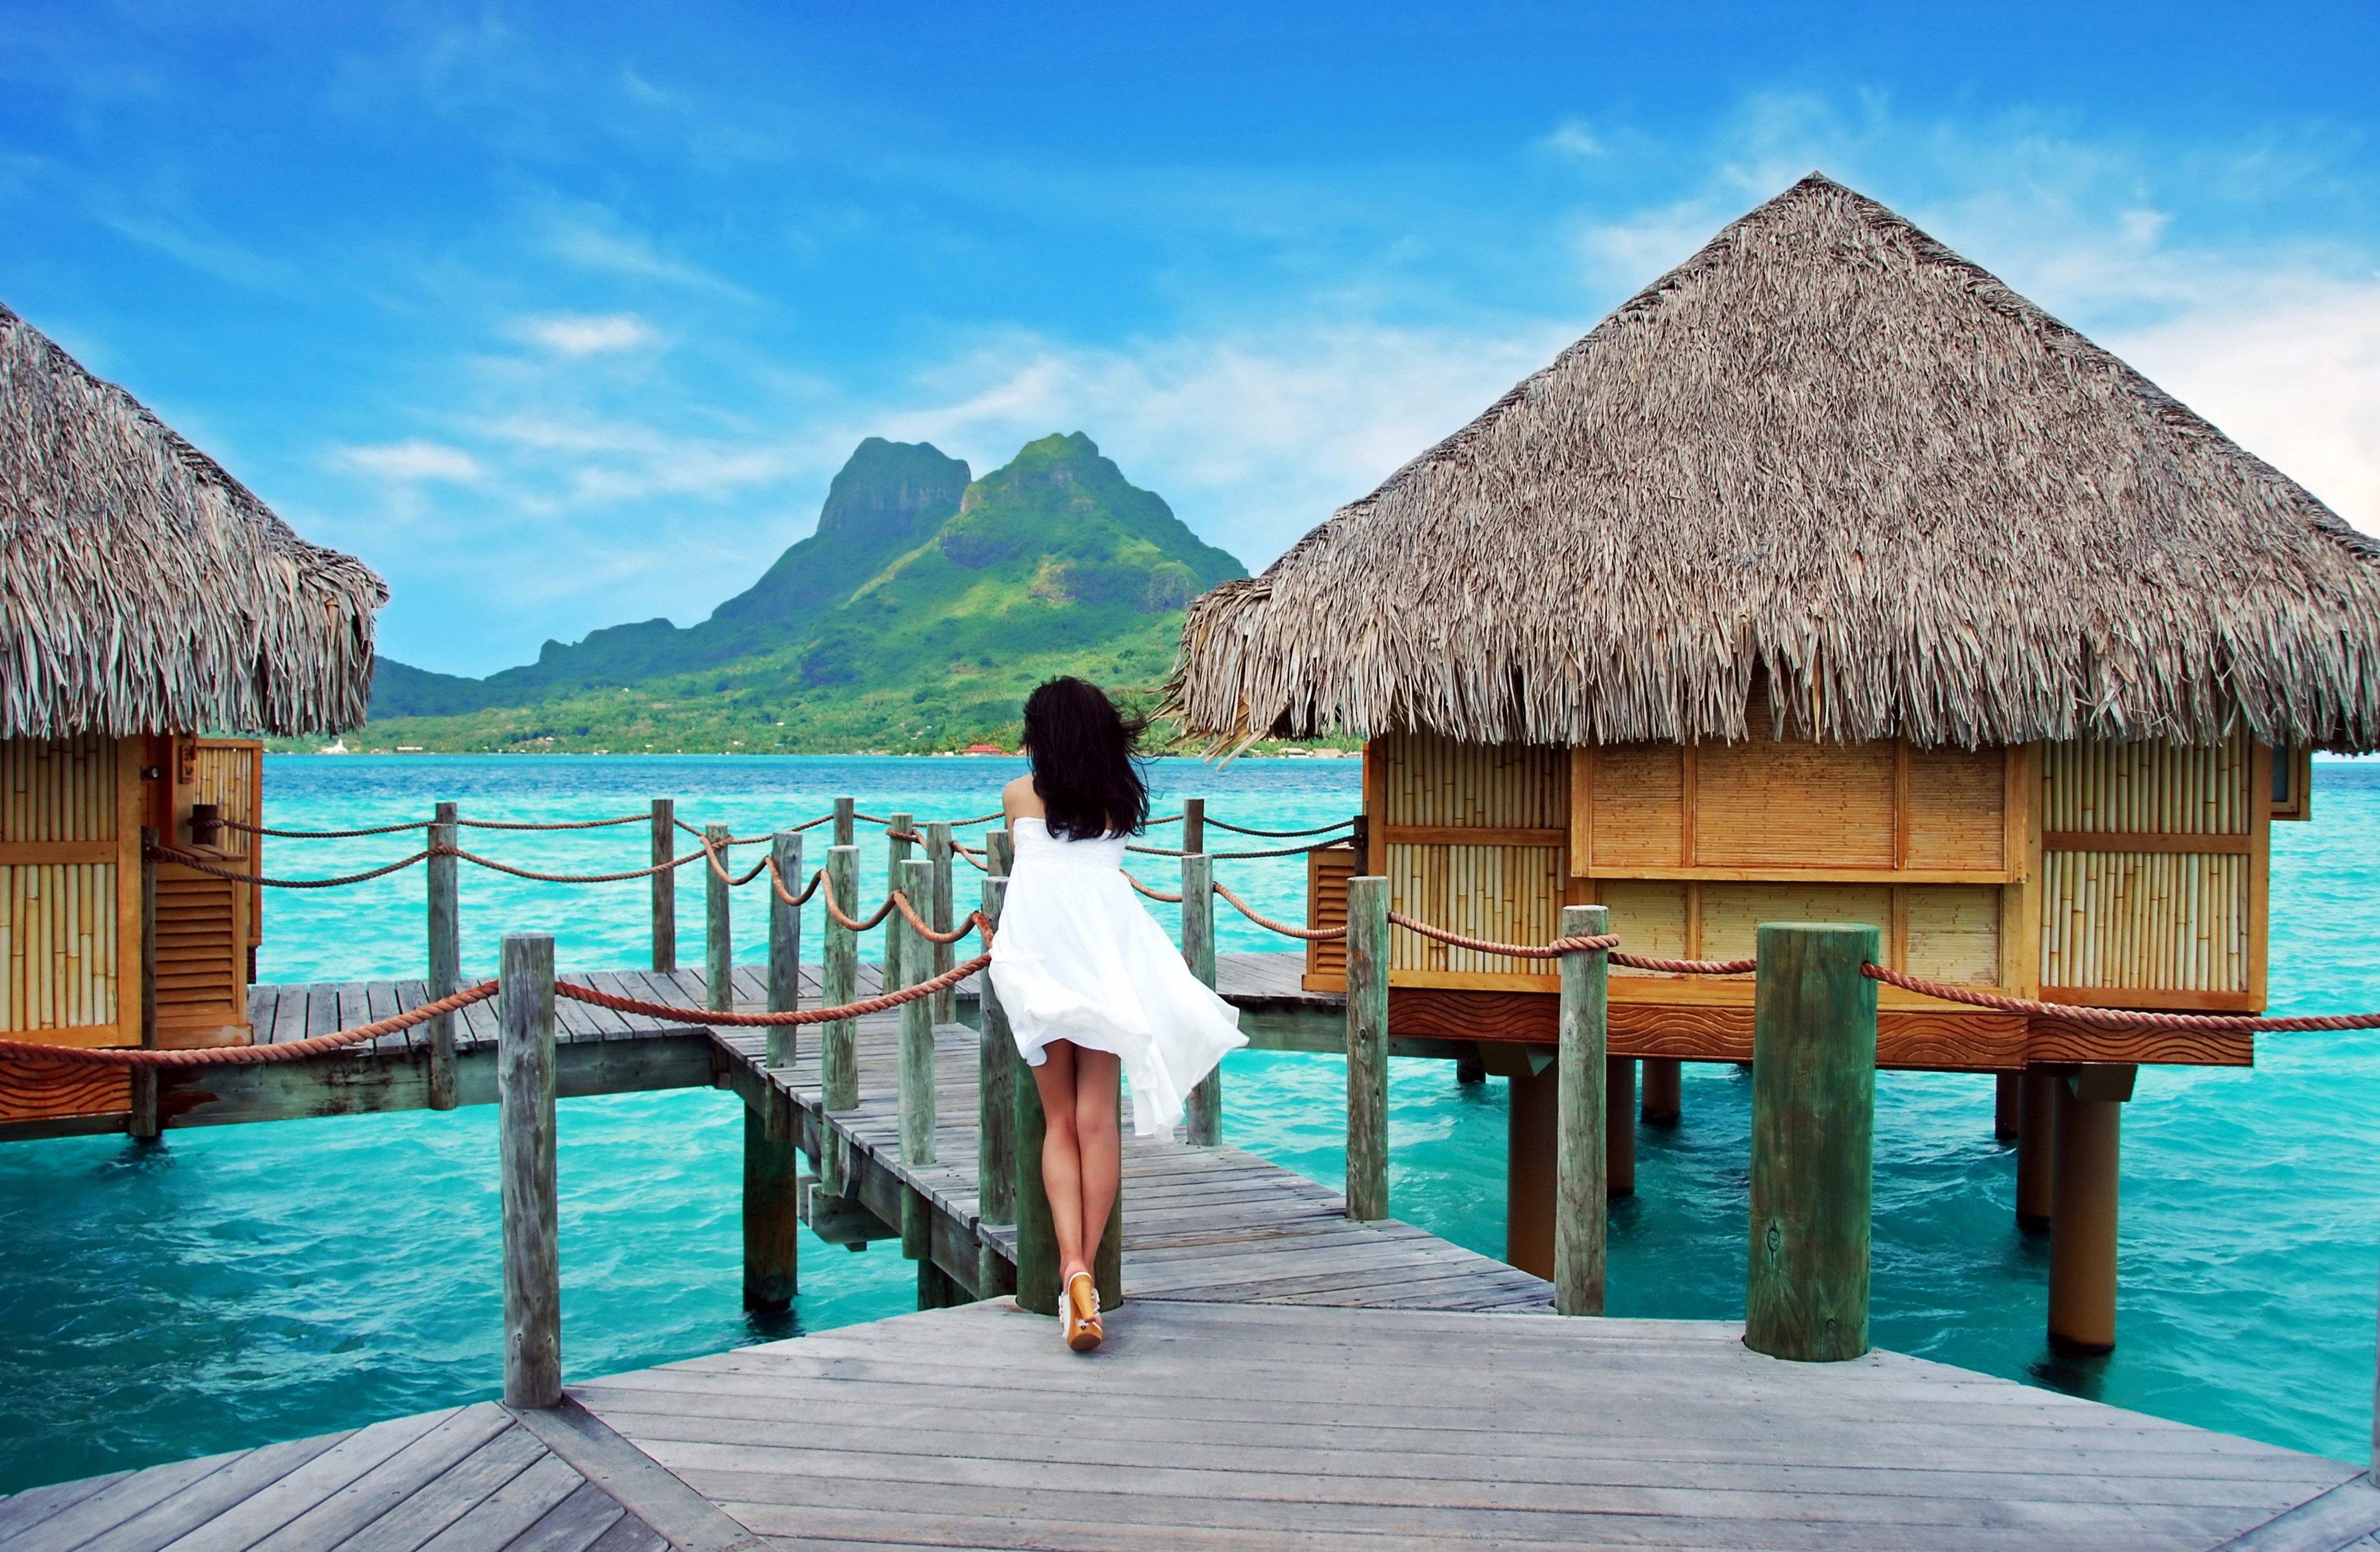 Tropical Ocean Pier Sea Palms Summer Beach Paradise Vacation Mood Wallpaper 3580x2334 441385 Wallpaperup